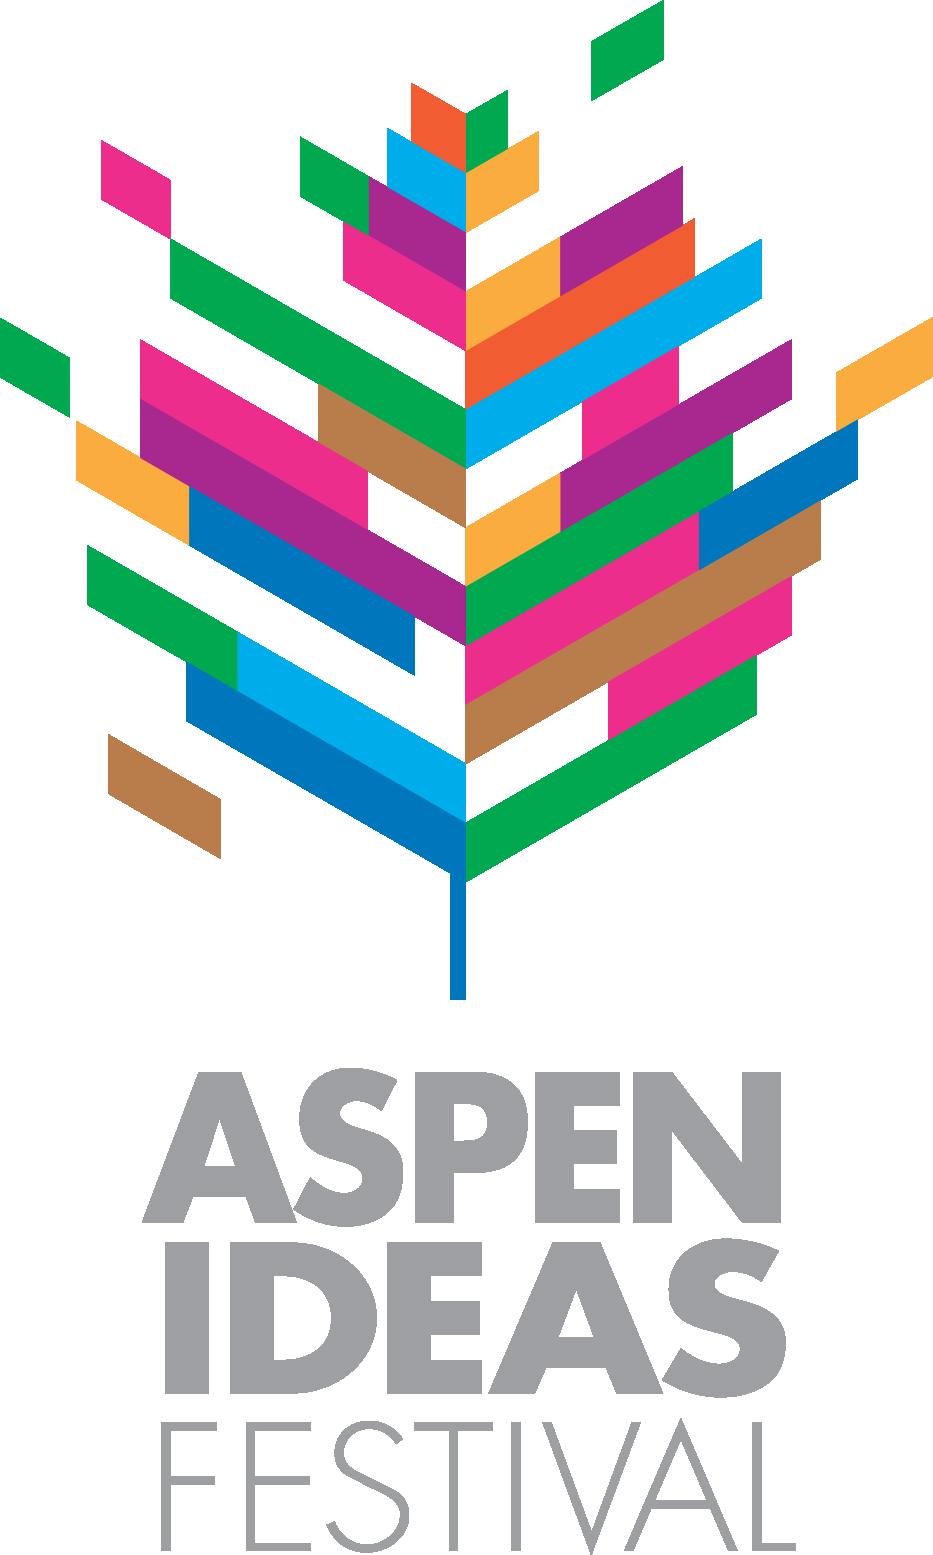 Aspen Ideas Festival 2020